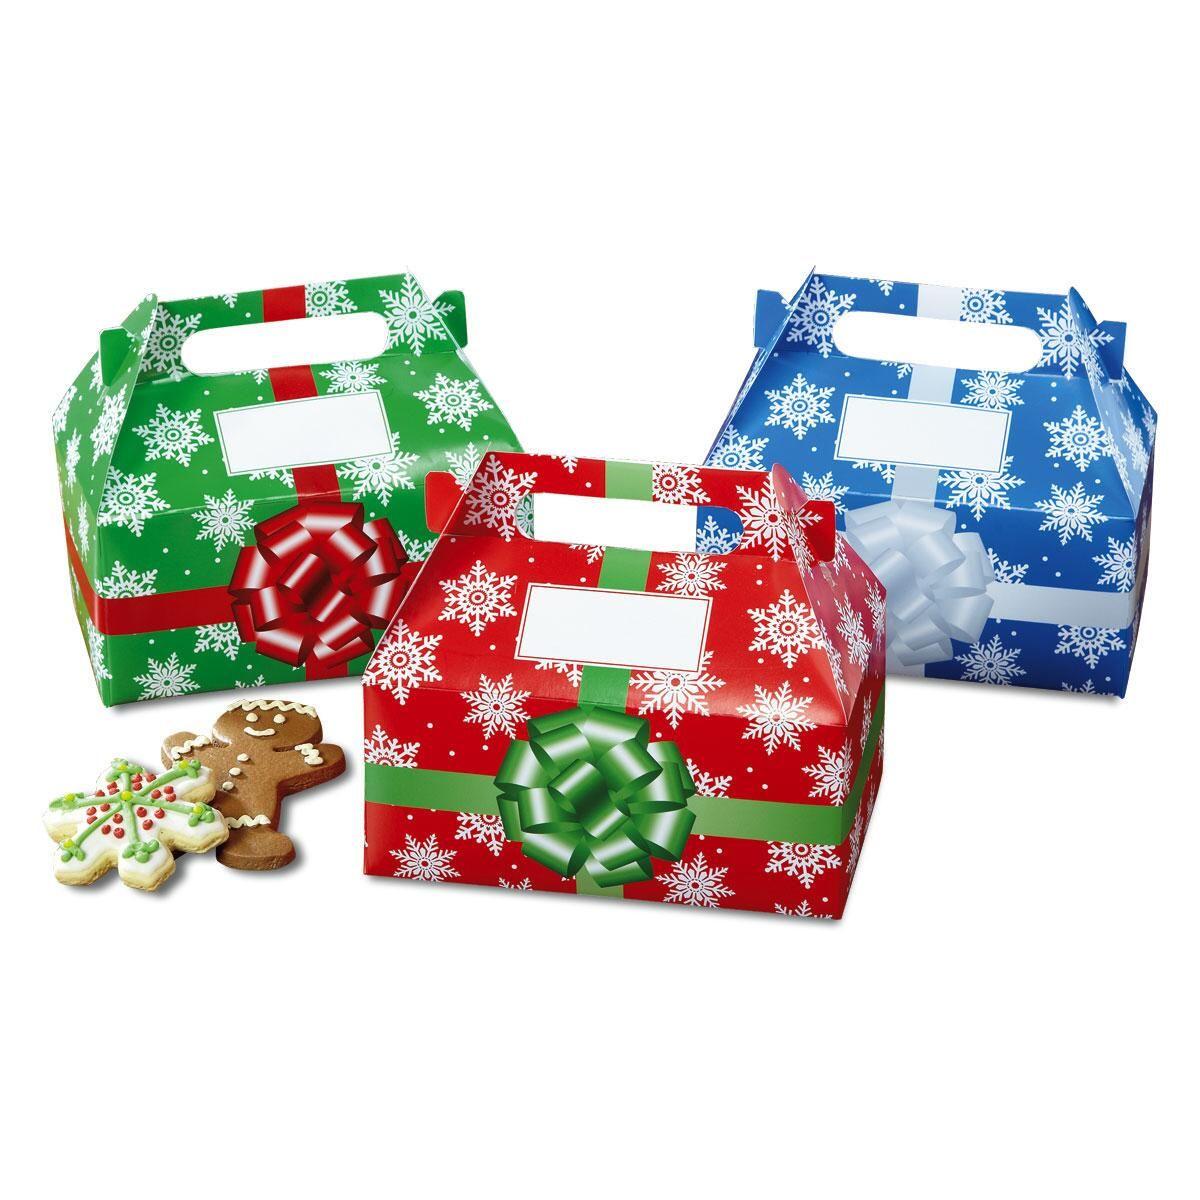 Snowflakes Holiday Fun Treat Boxes